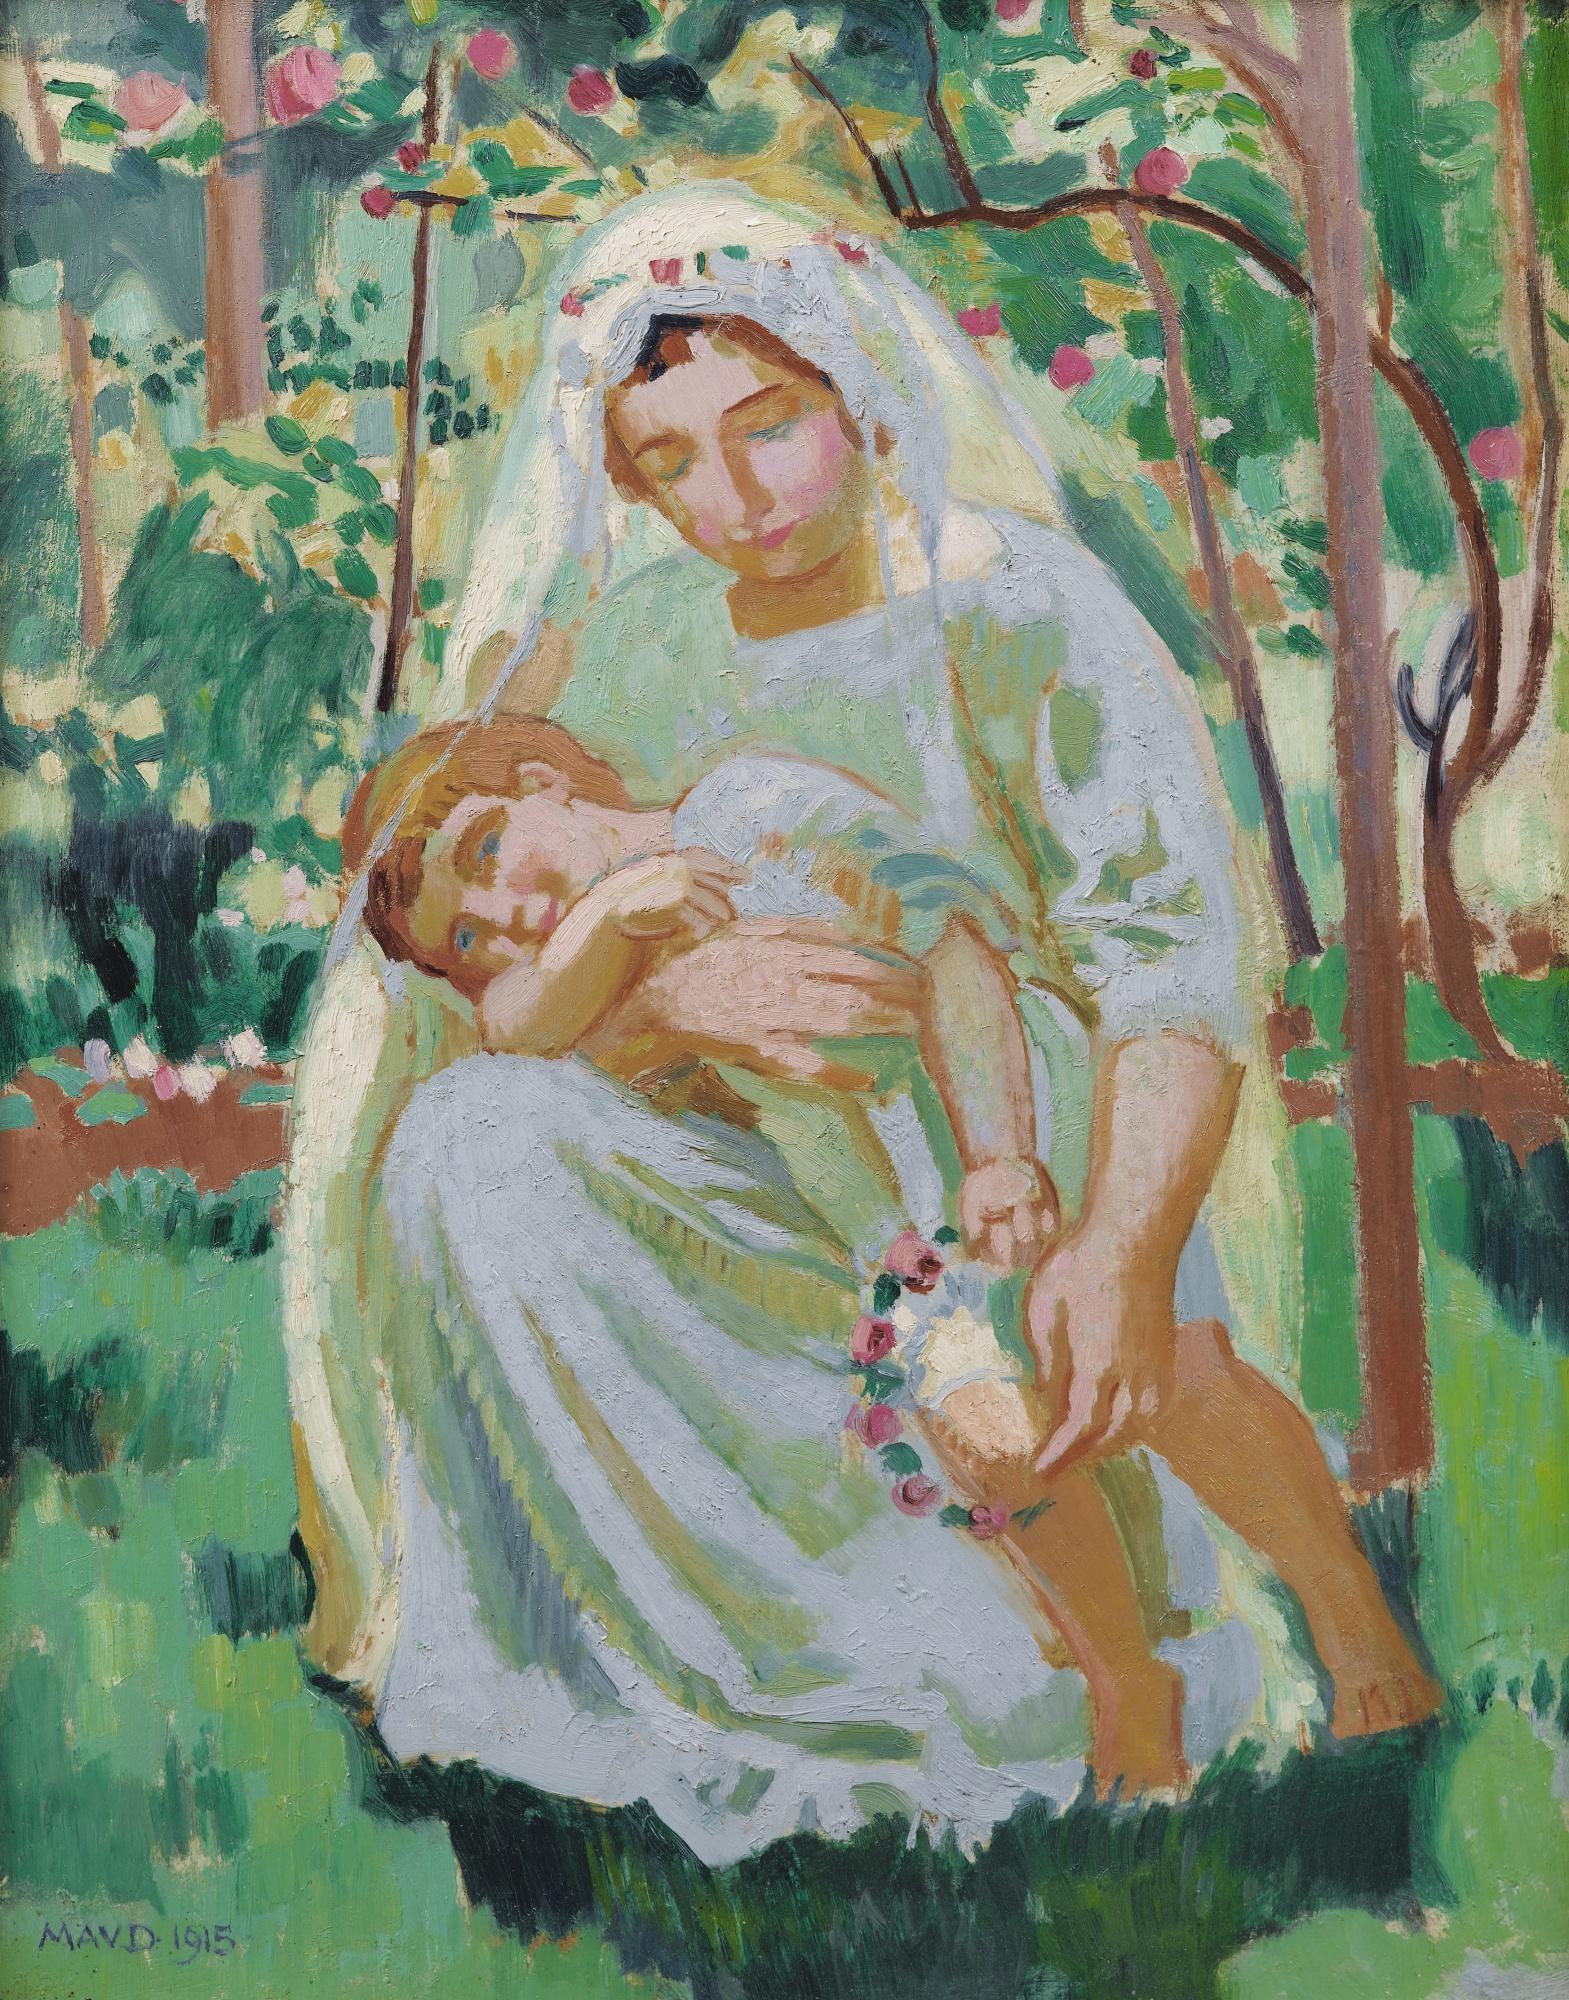 Maurice Denis-Maternite Ensoleillee-1915